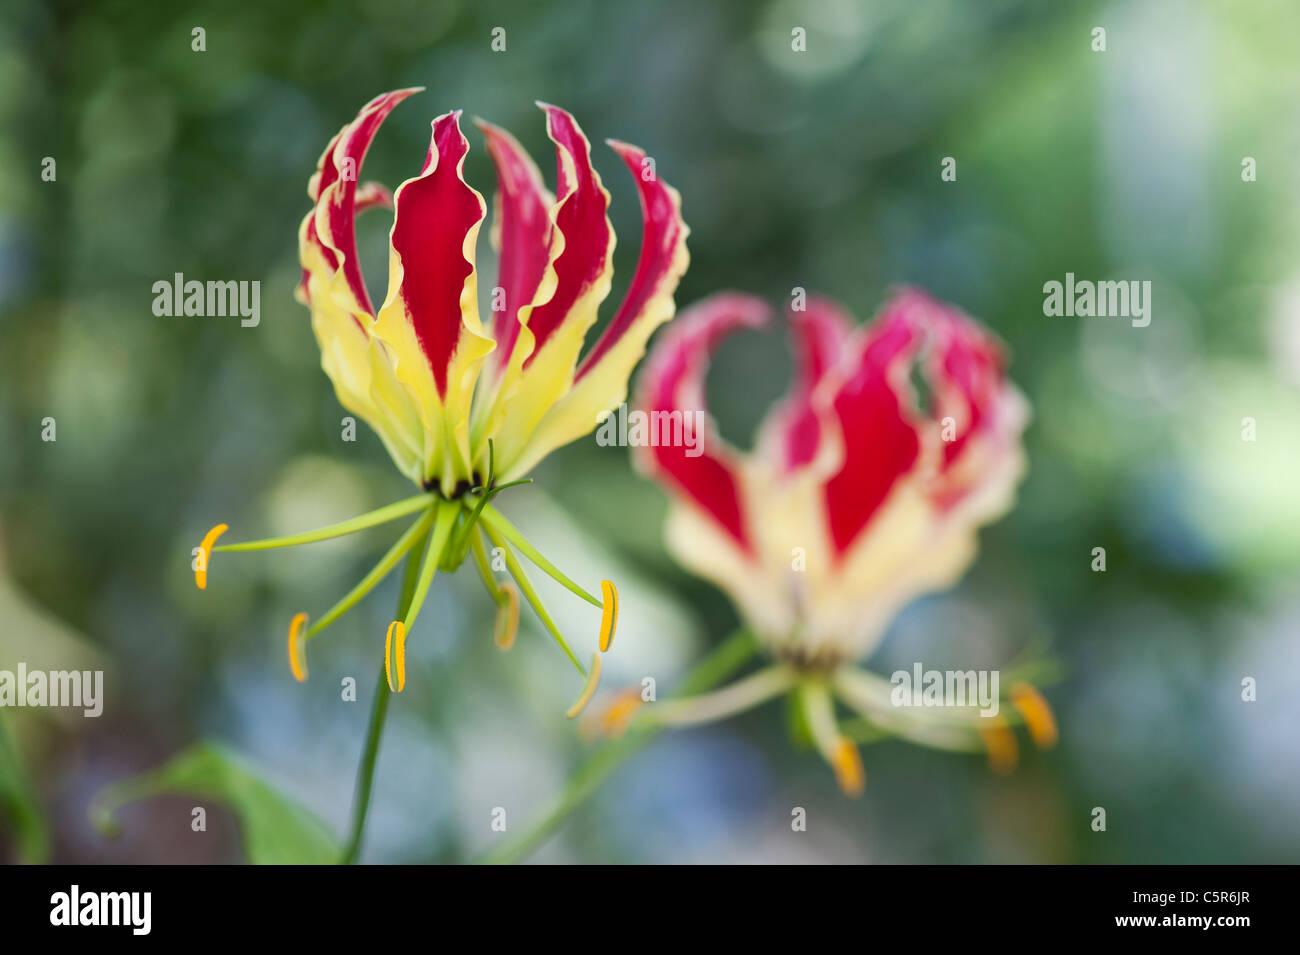 Gloriosa superba 'Rothschildiana'. Glory lily. Flame lily. Gloriosa lily - Stock Image